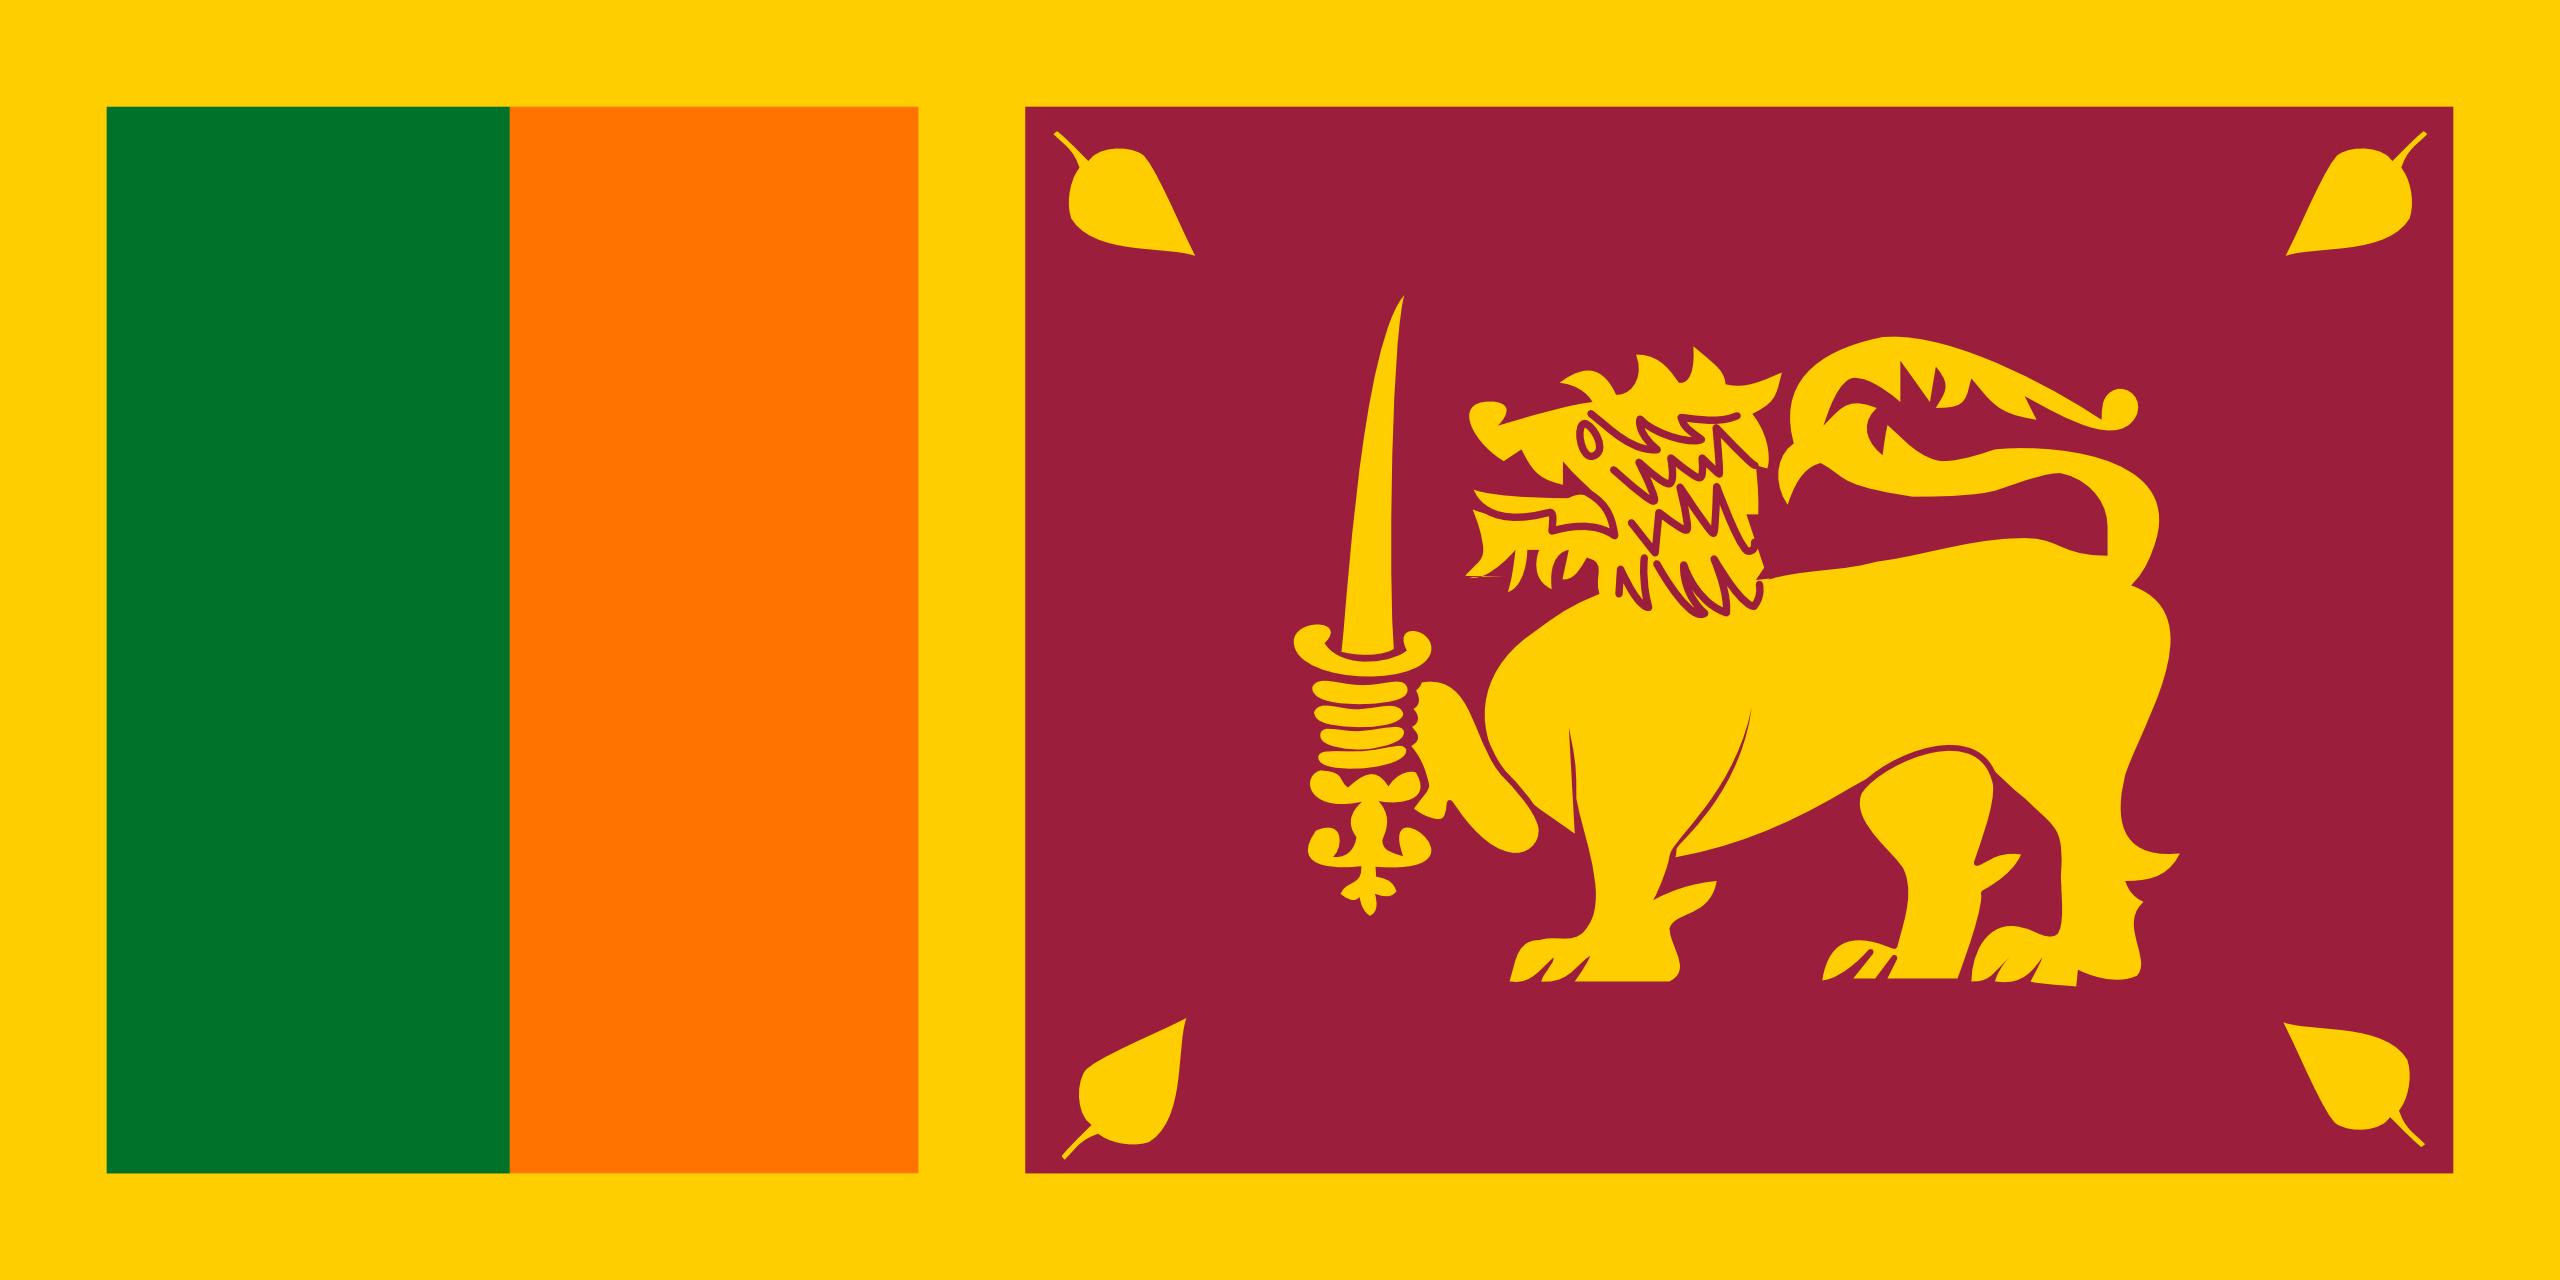 sri lanka, Land, Emblem, Logo, Symbol - Wallpaper HD - Prof.-falken.com